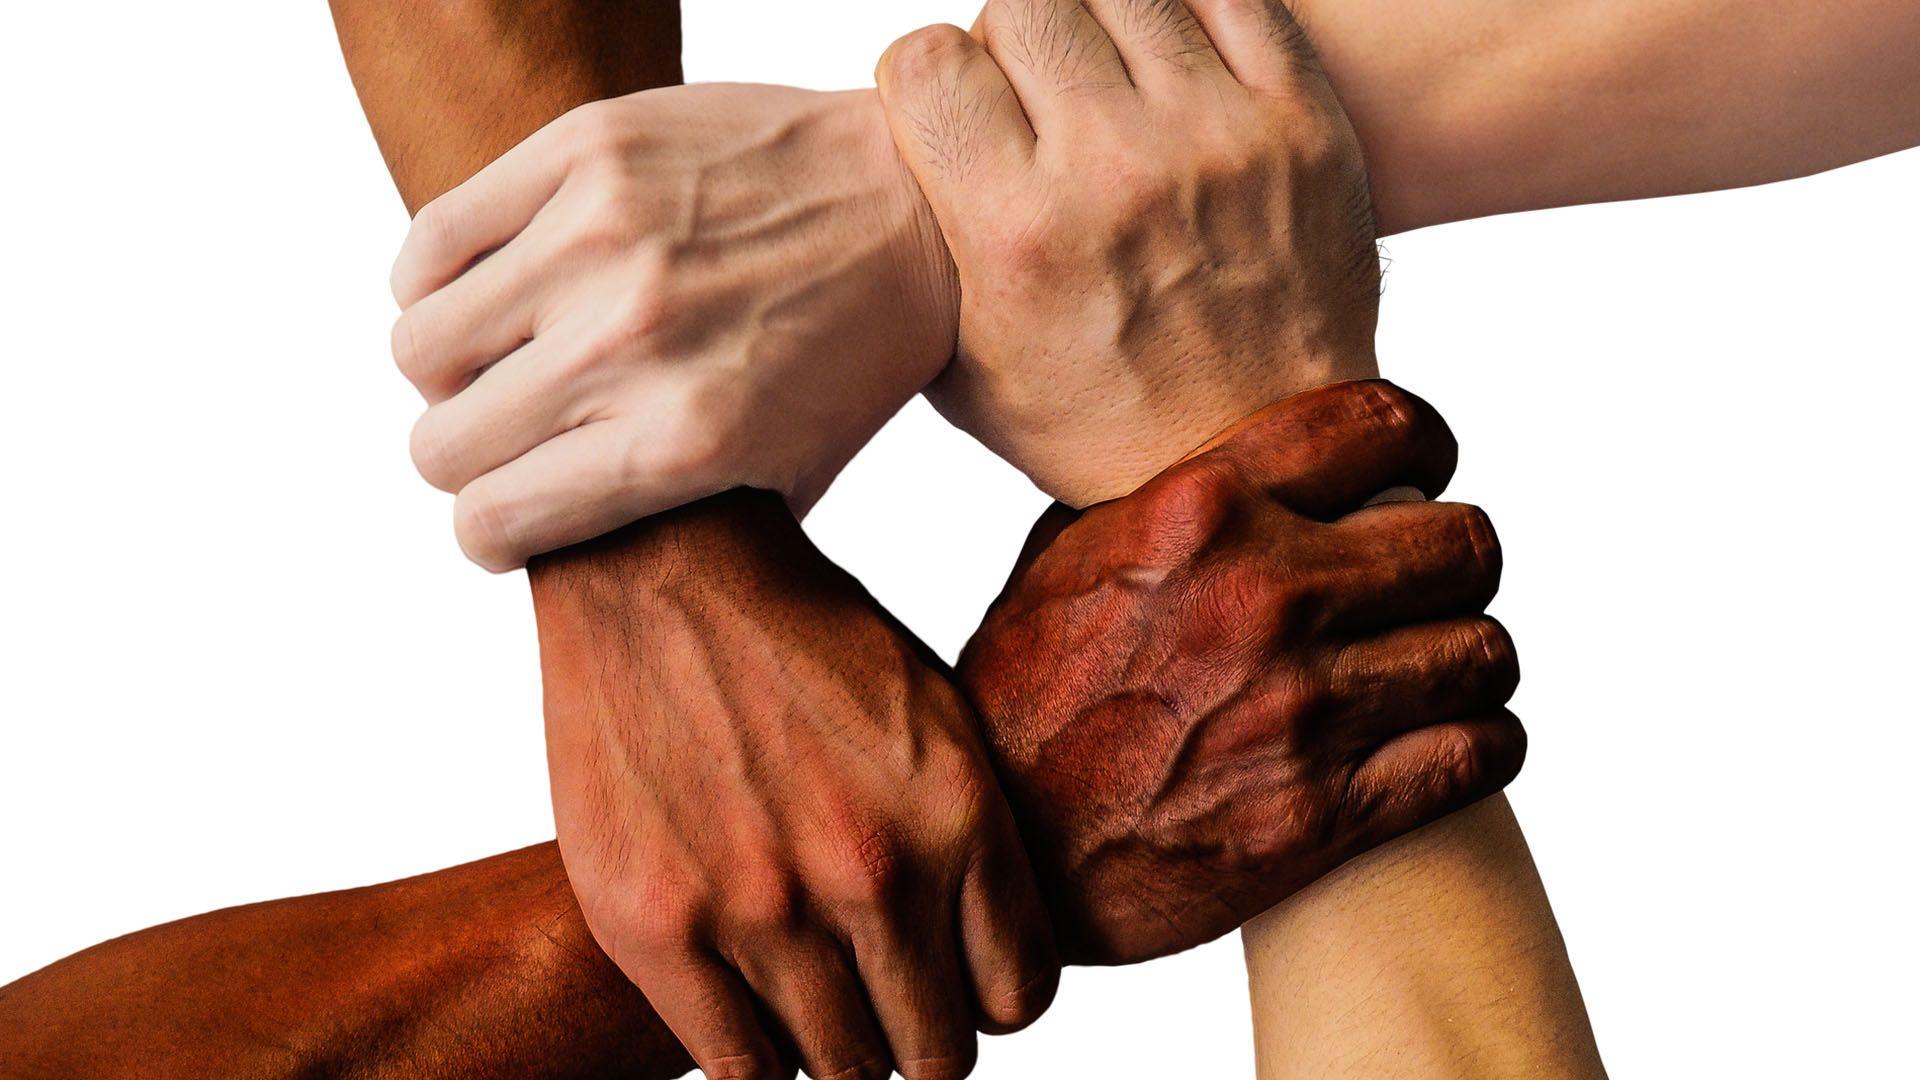 Change Your Past Team Spirit 4 hands